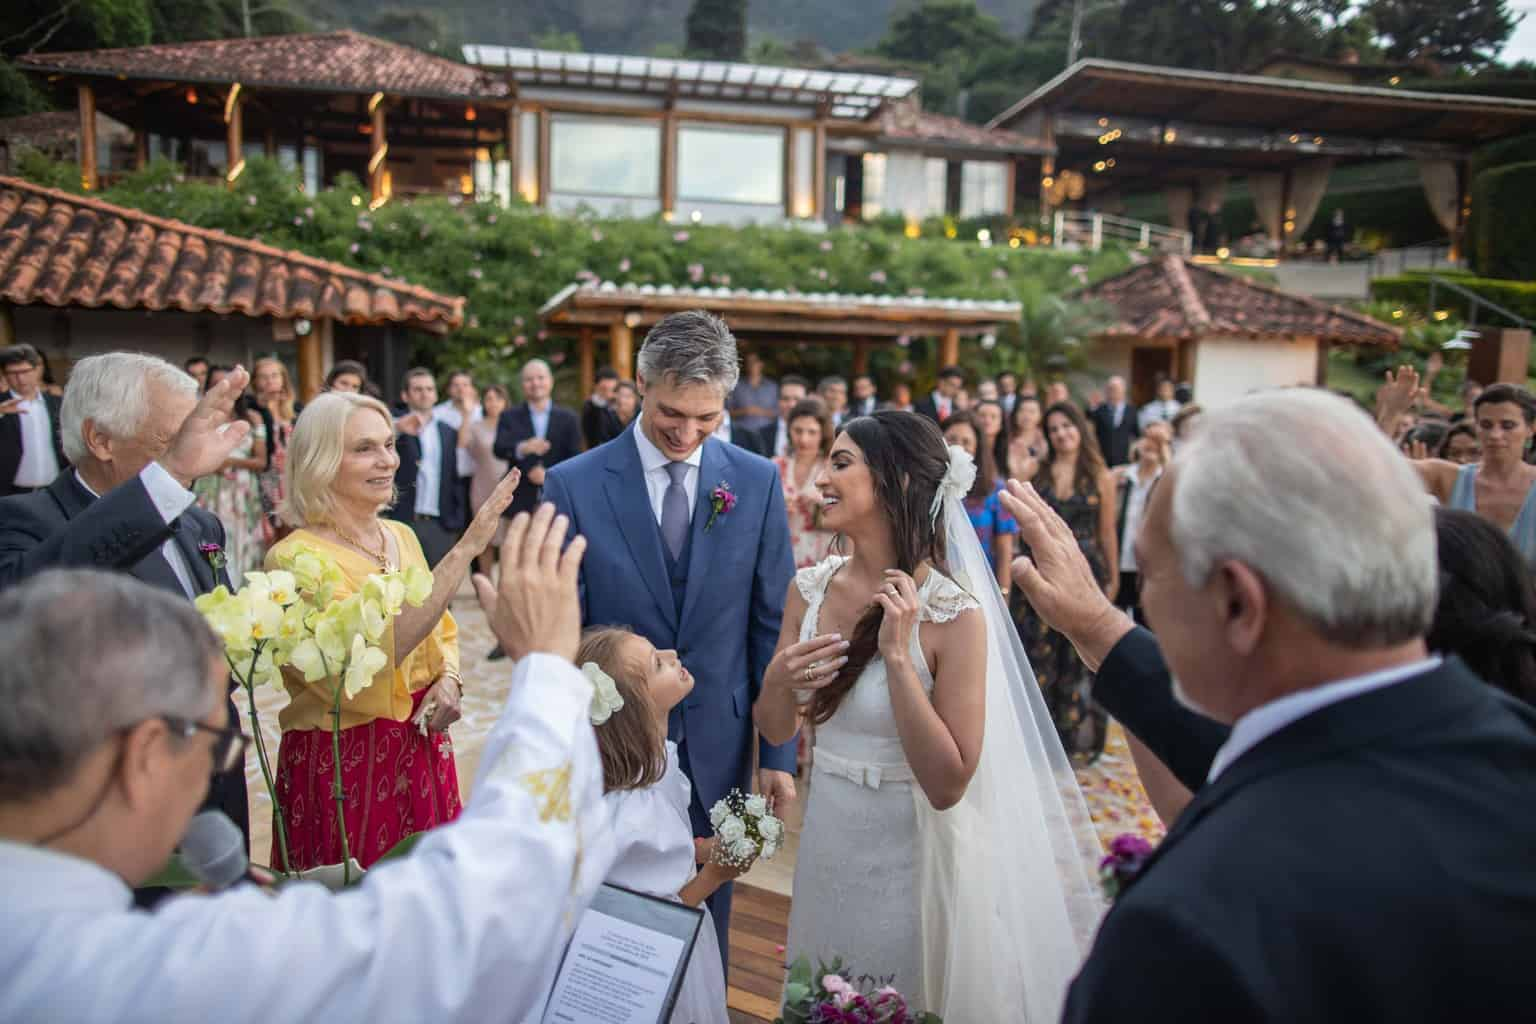 casamento-na-serra-cerimonia-ao-ar-livre-Fotografia-Laura-Campanella-graviola-filmes-Juliana-e-Sebastian-Pousada-La-Belle-Bruna250